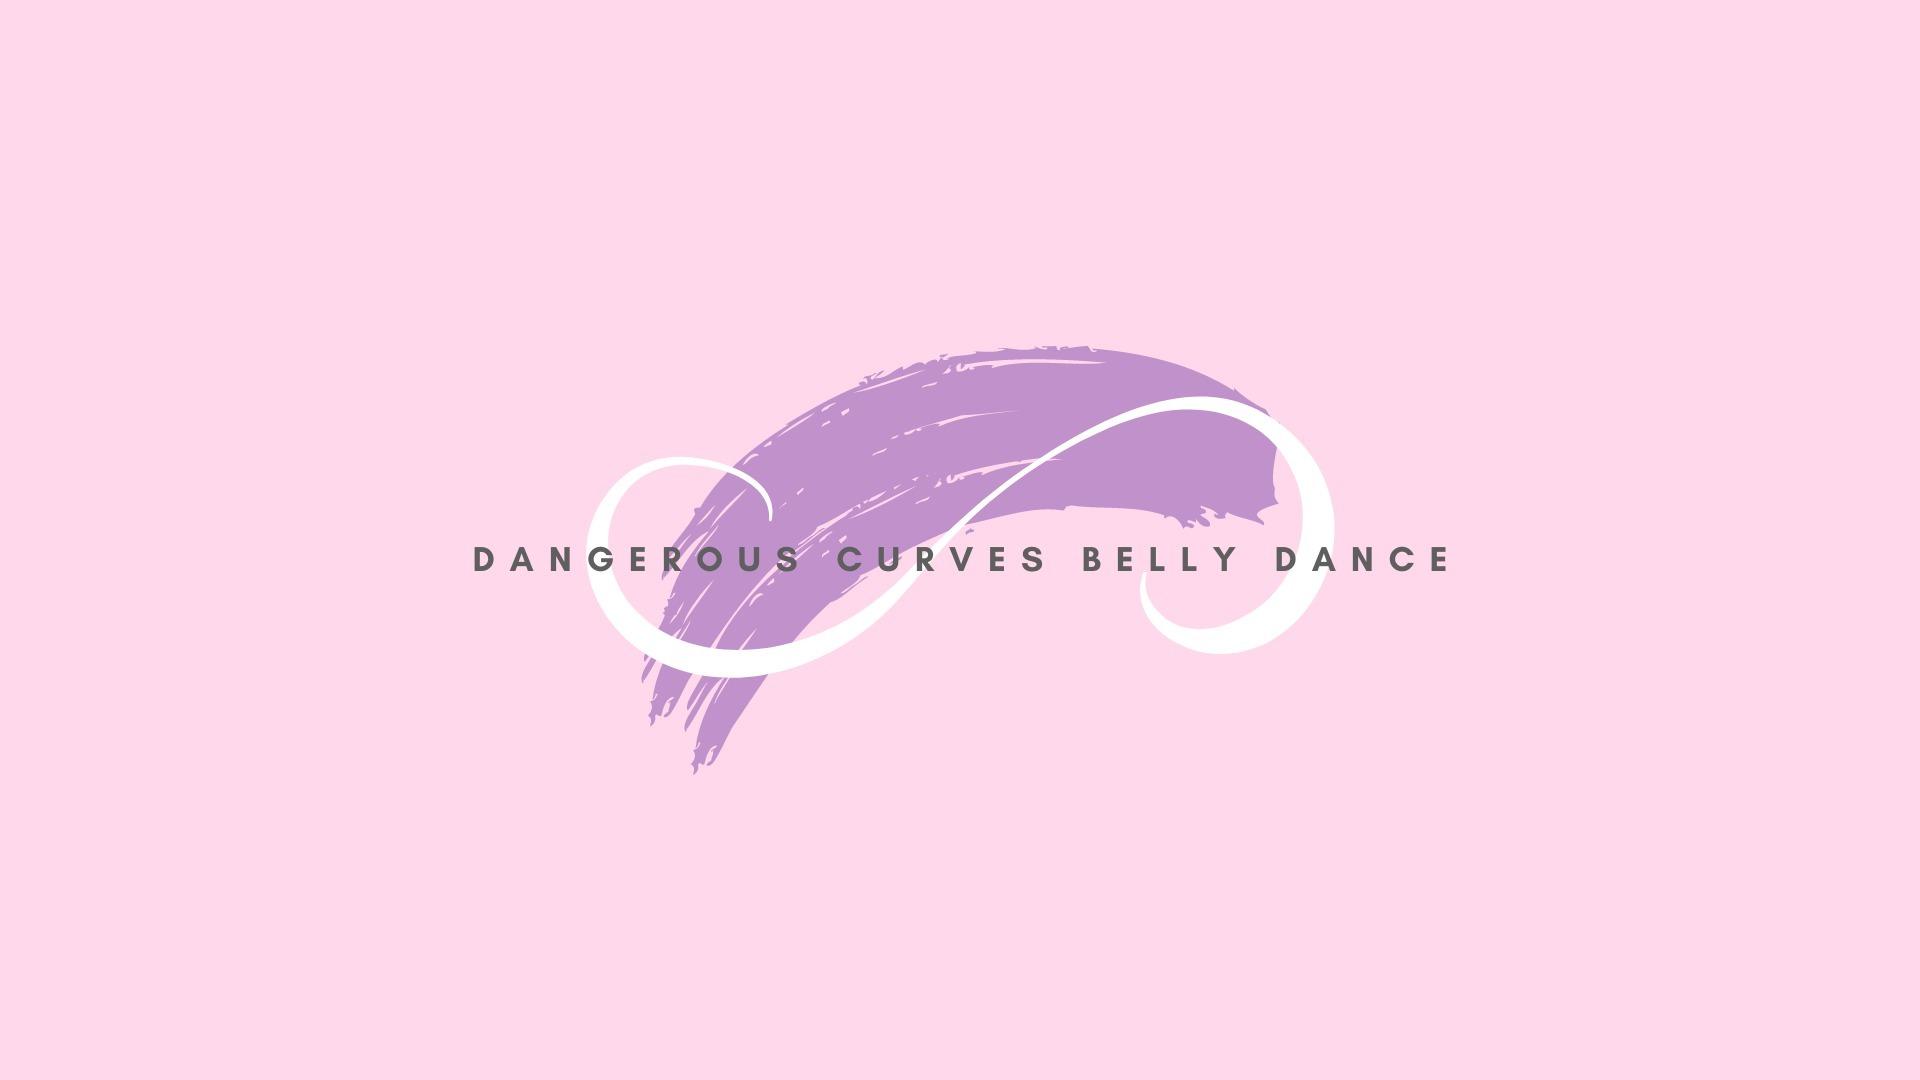 Dangerous Curves Belly Dance (@adiraelham) Cover Image